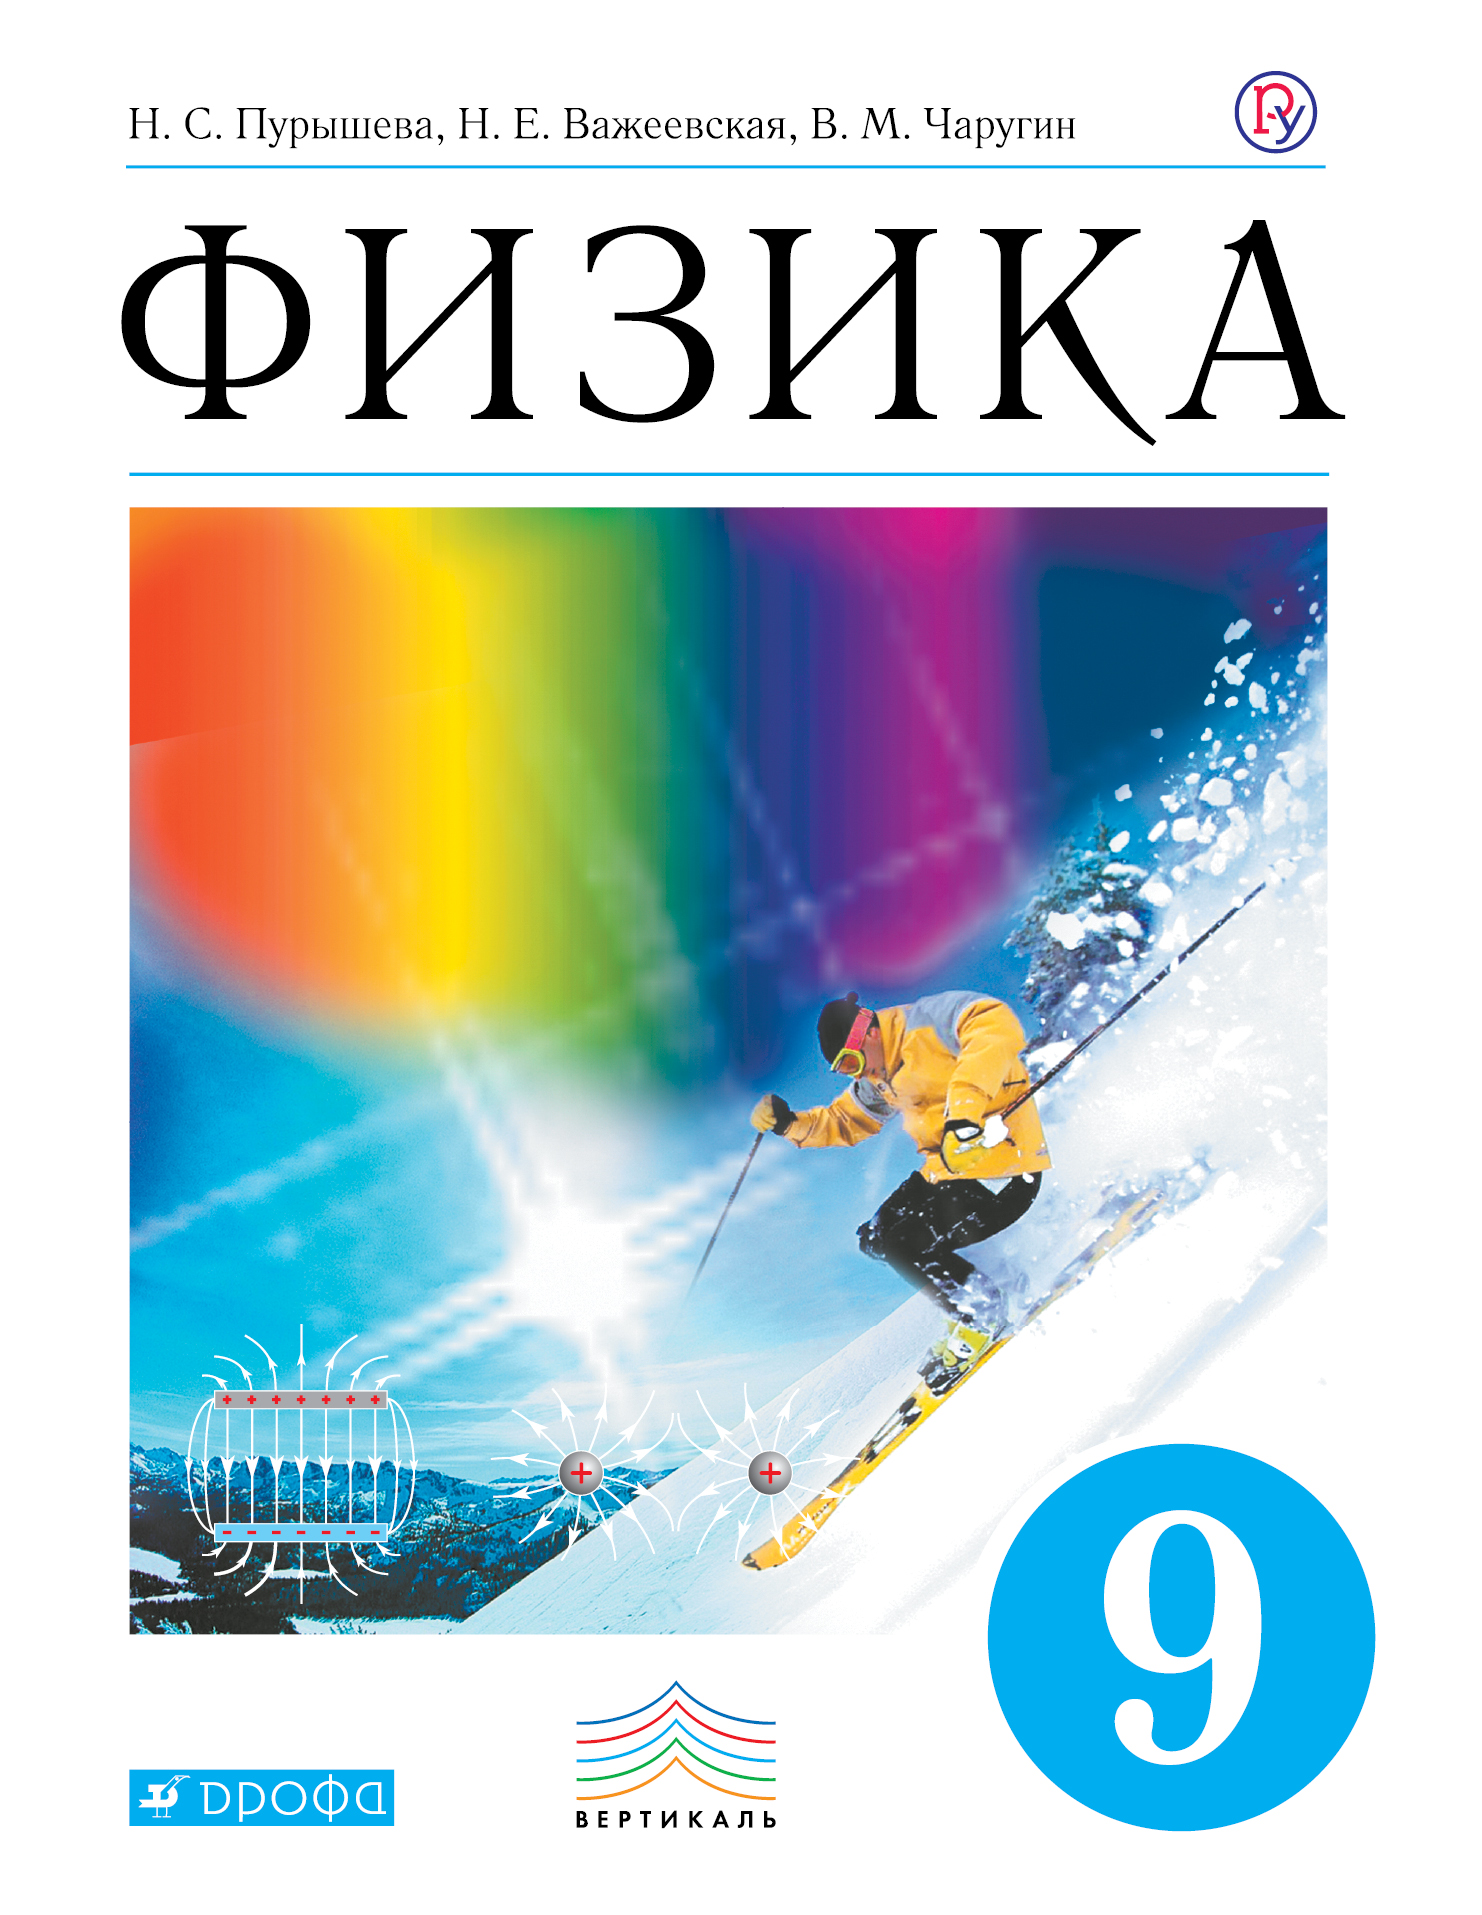 Н. С. Пурышева,Н. Е. Важеевская,В. М. Чаругин Физика. 9 класс. Учебник александр русаков физика колебания и волны